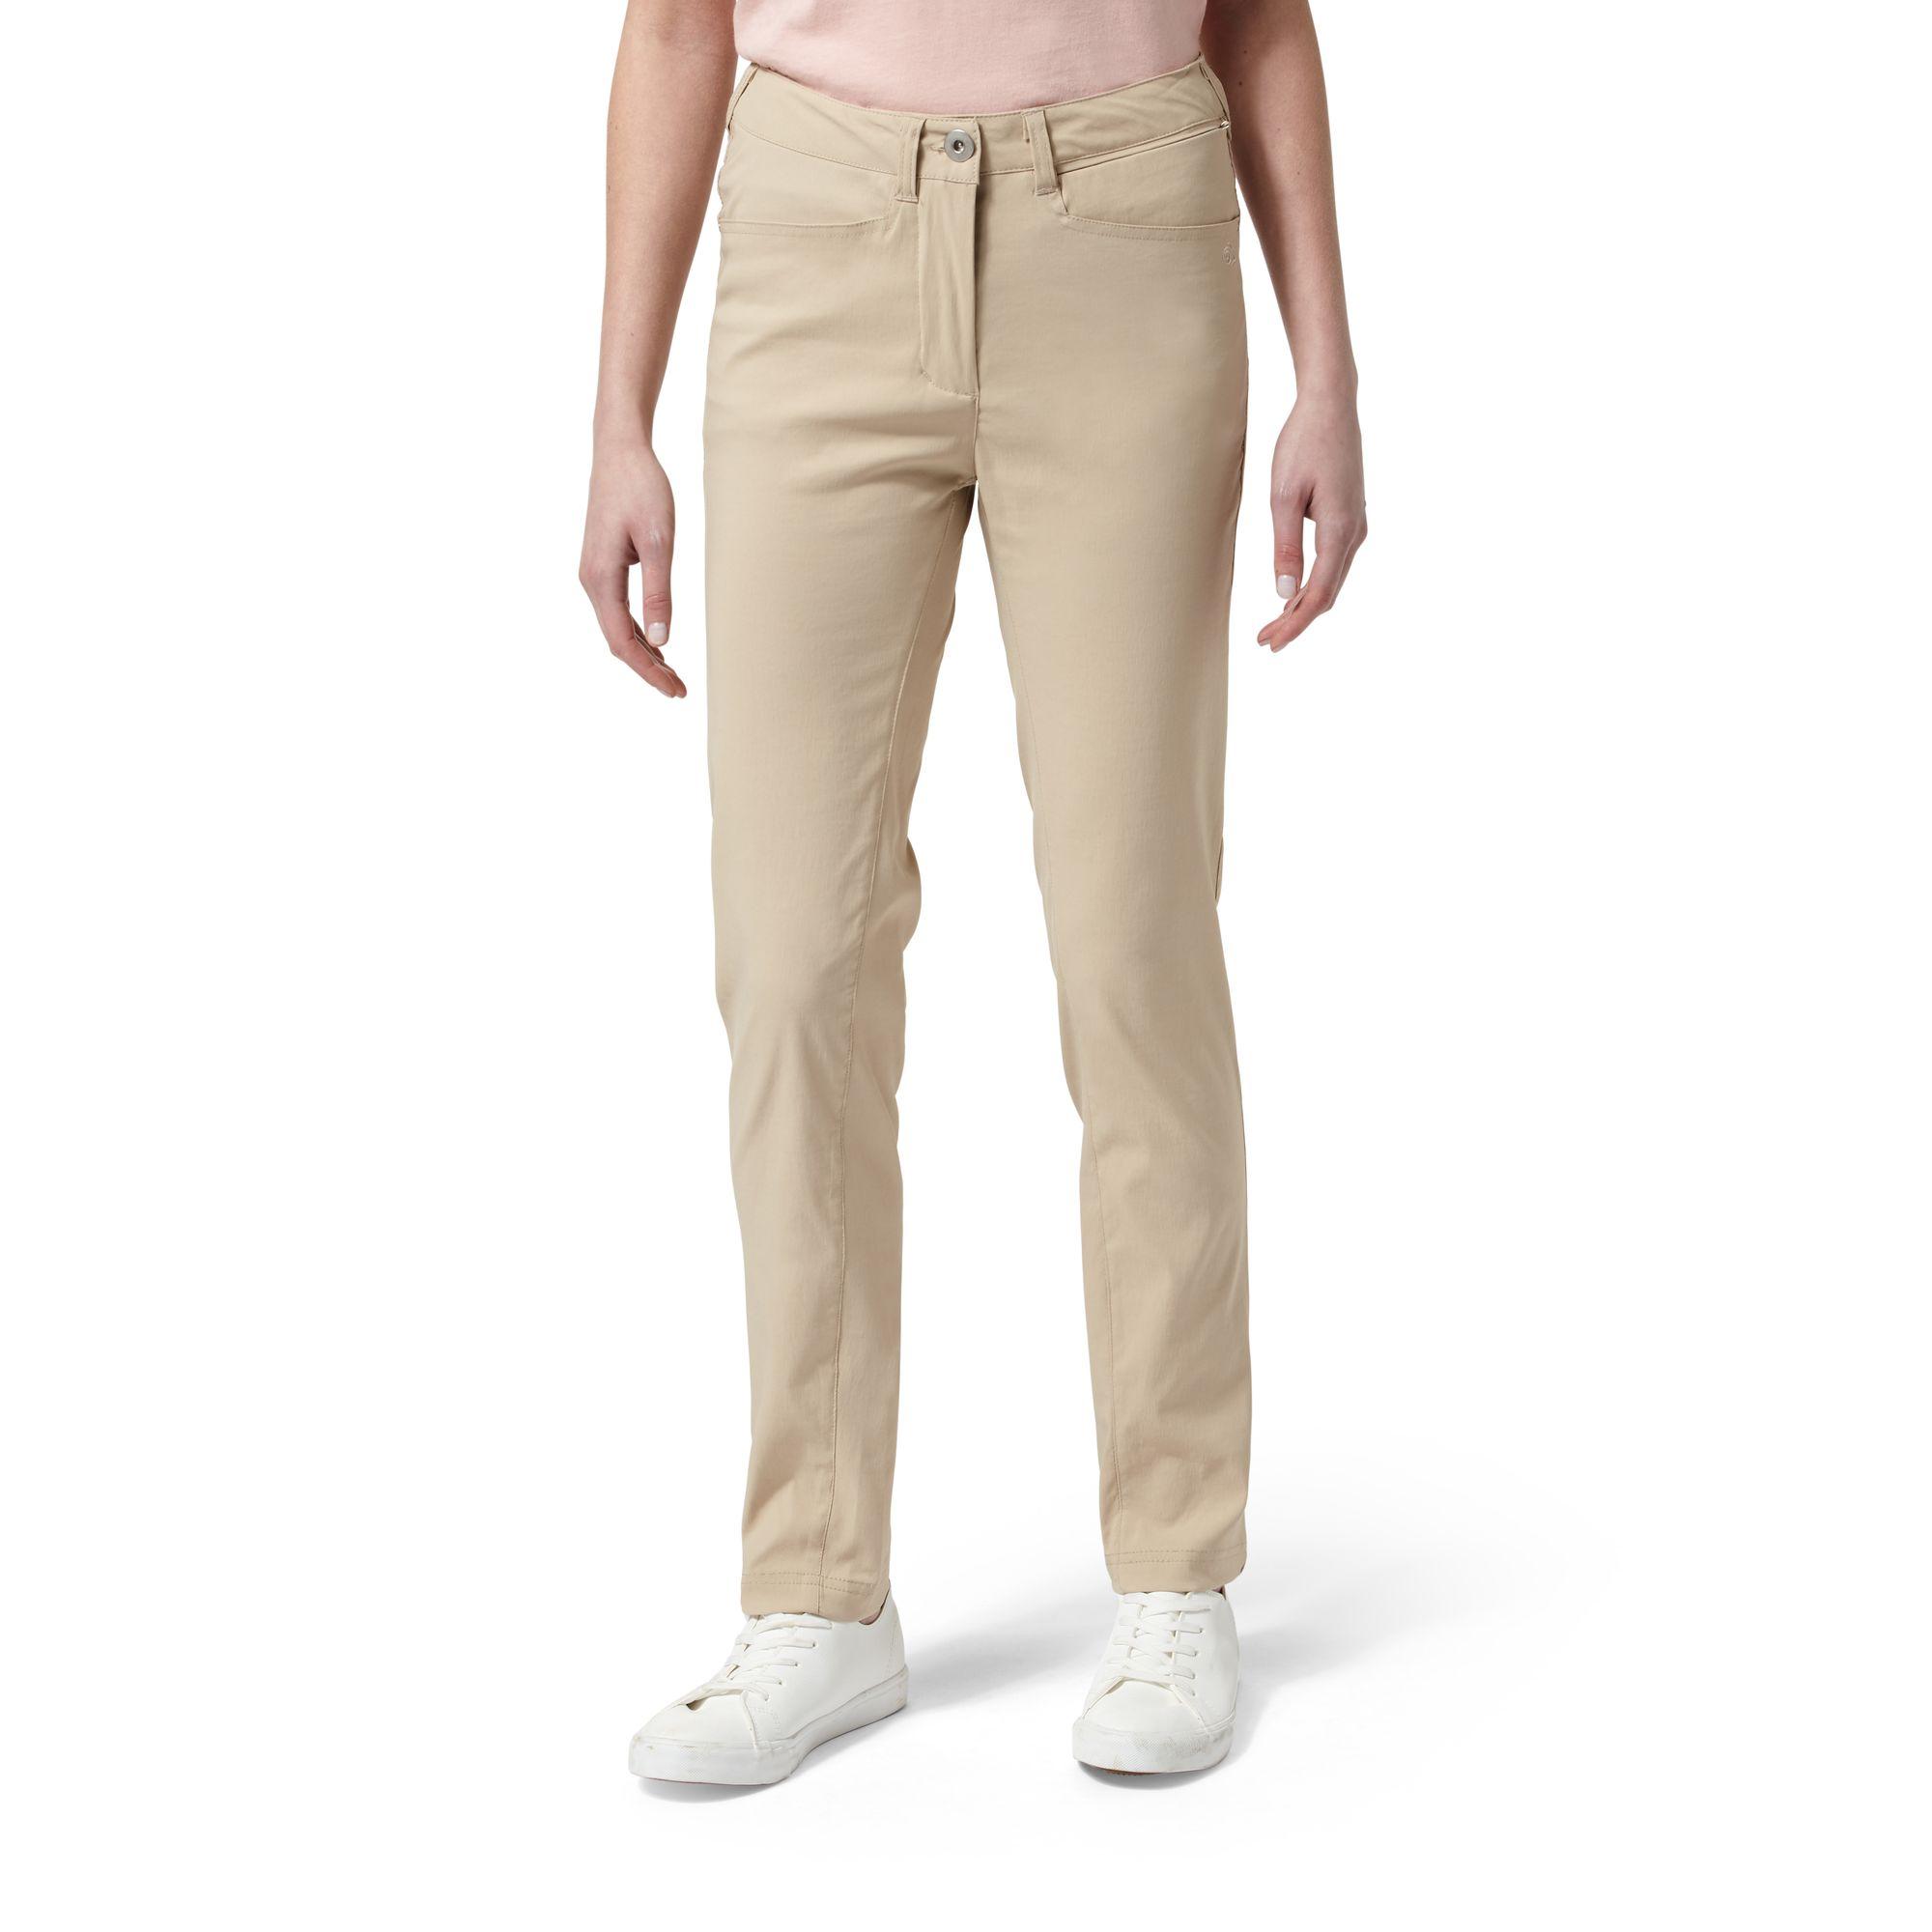 Craghoppers-Pantalon-ADVENTURE-Femme-CG869 miniature 10